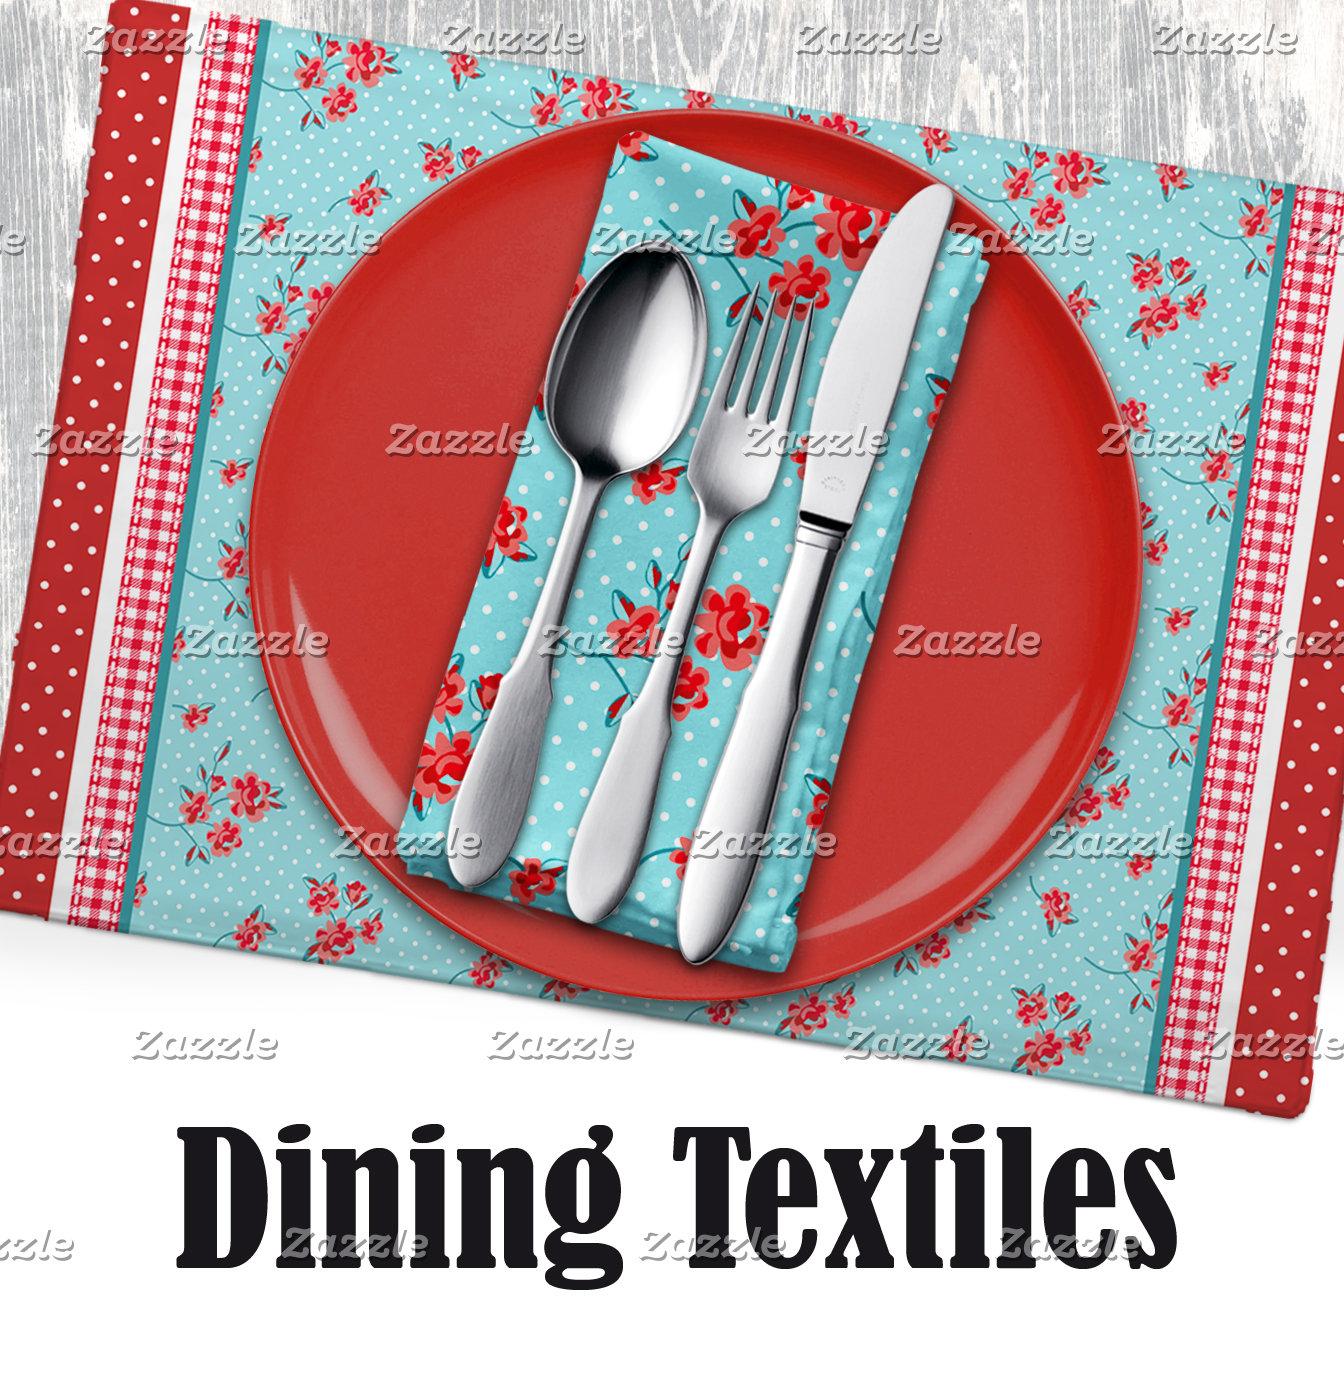 Table Textiles